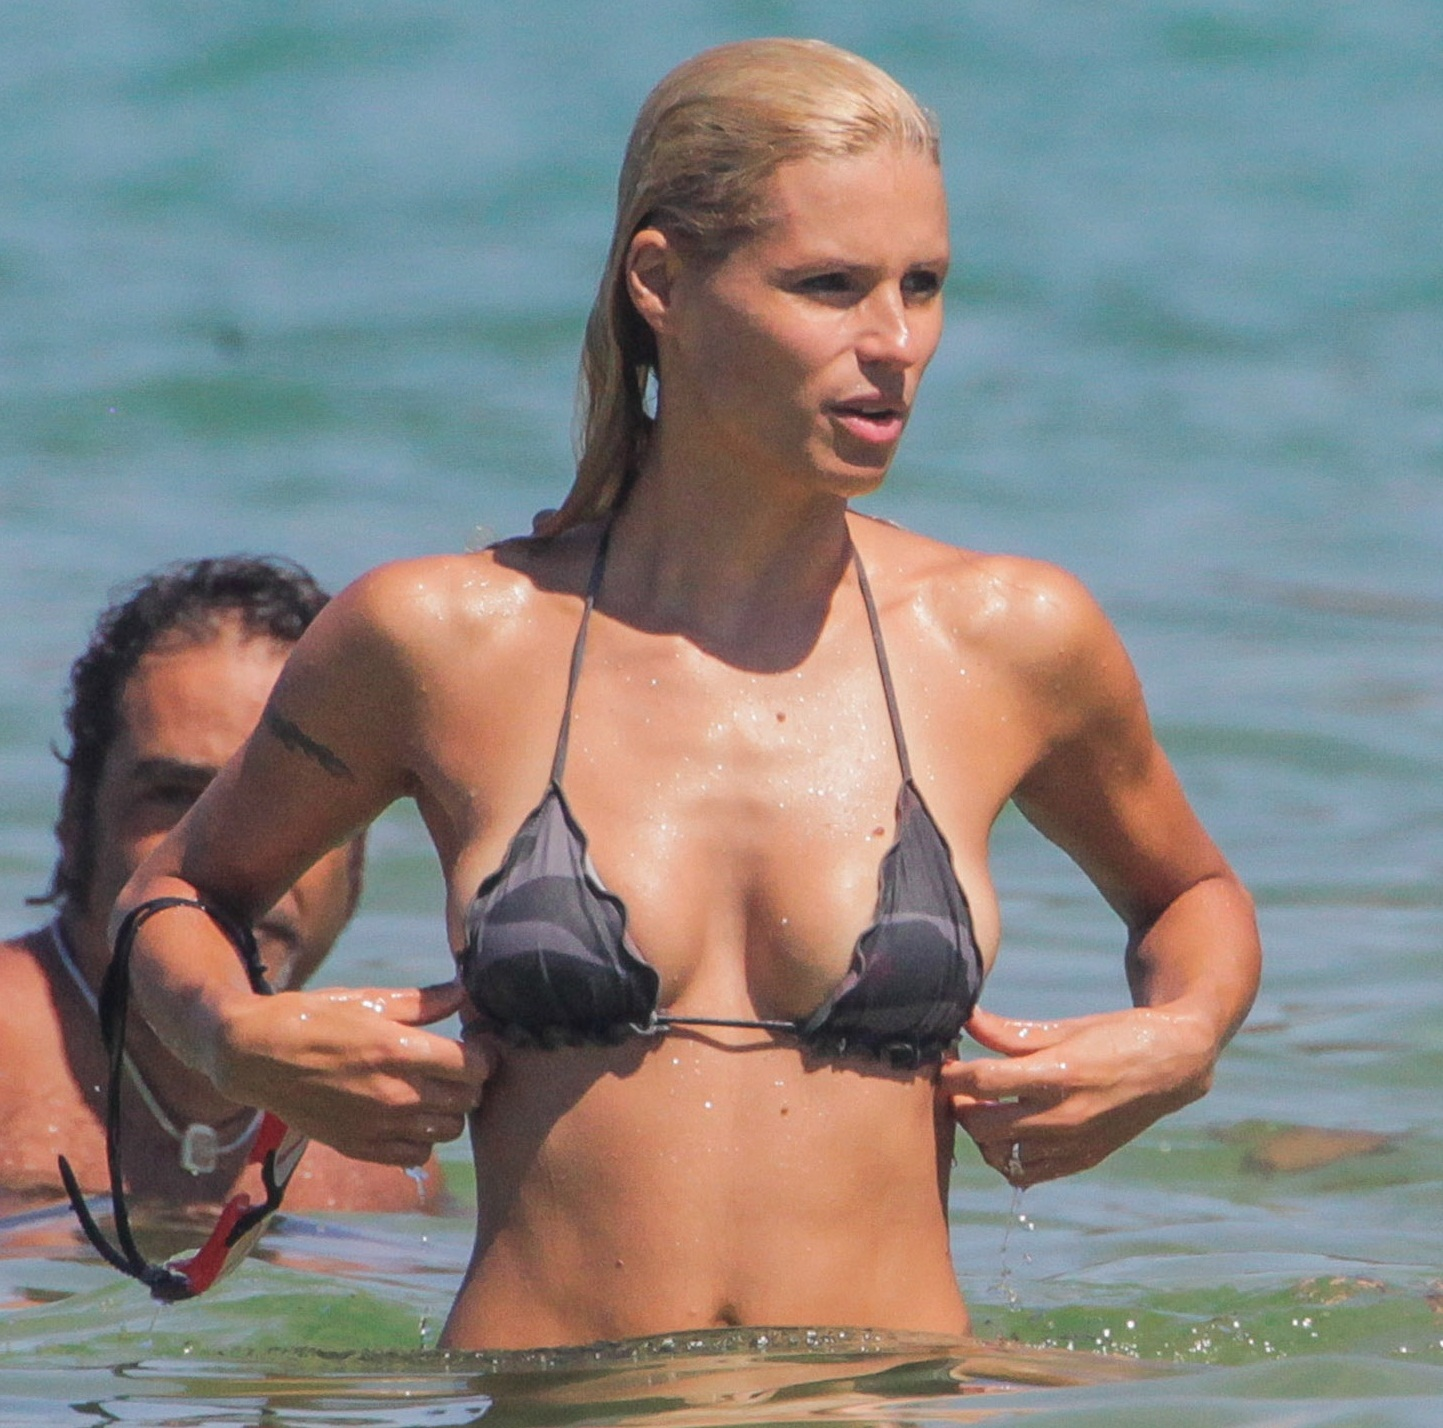 Hot pic: Michelle Hunziker bikini candids at Elba Island